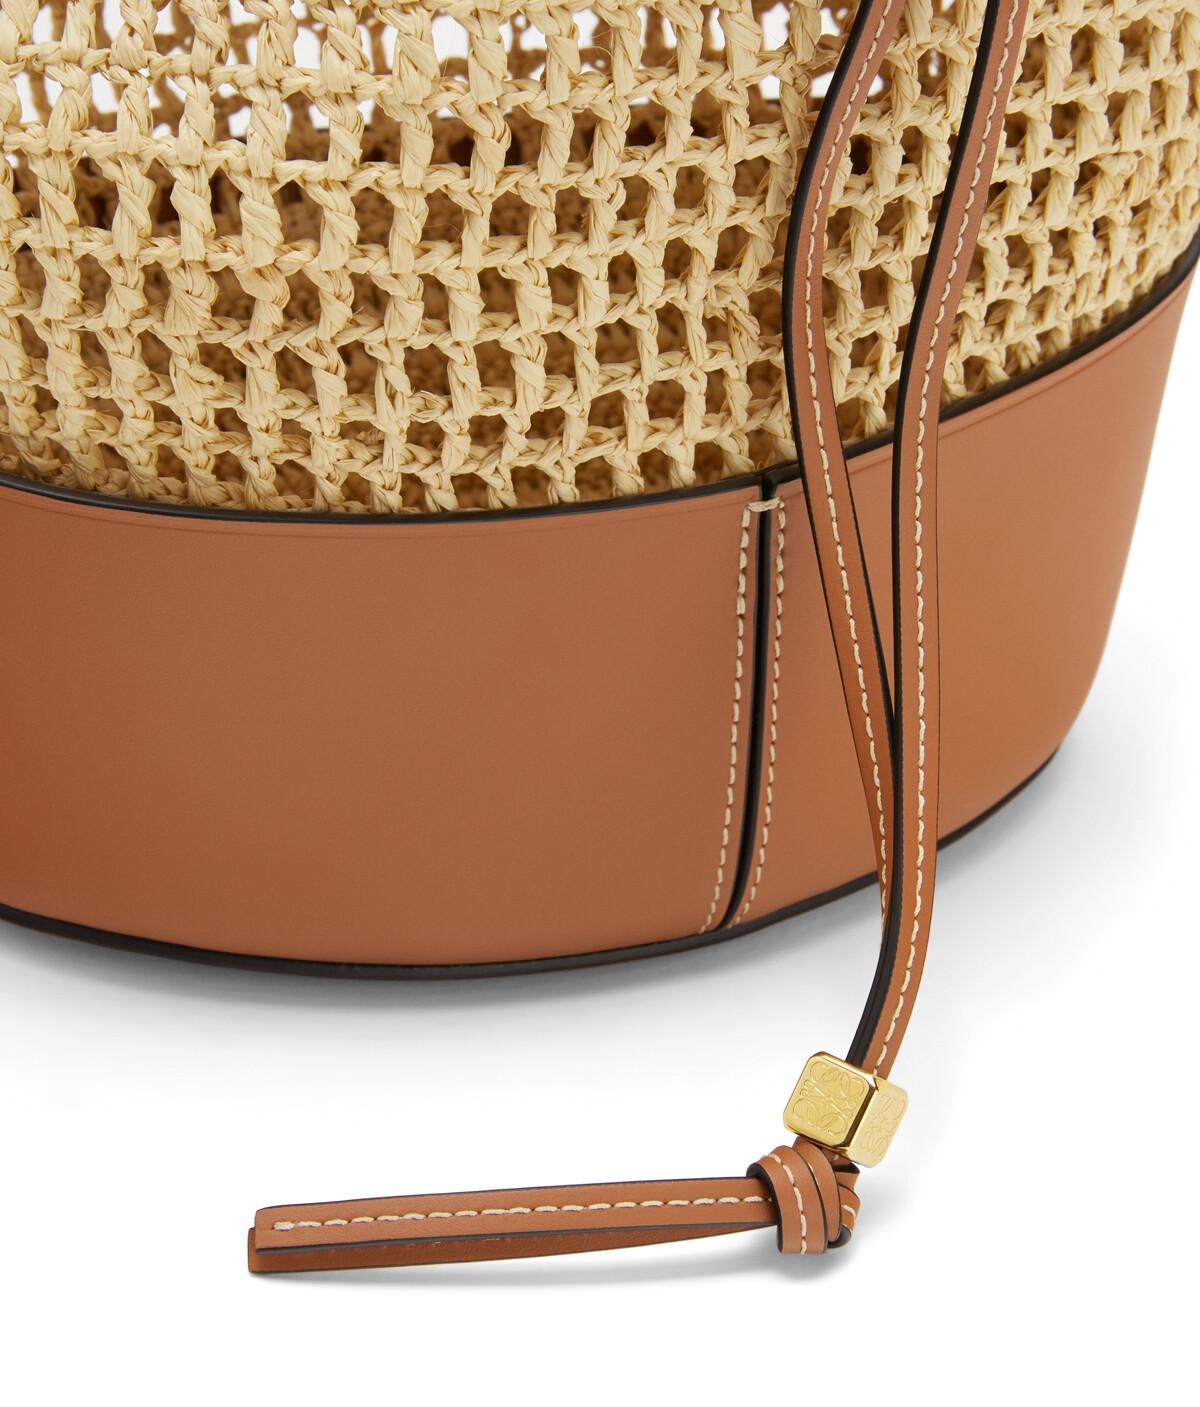 LOEWE Balloon Bag In Raffia And Calfskin Natural/Tan front